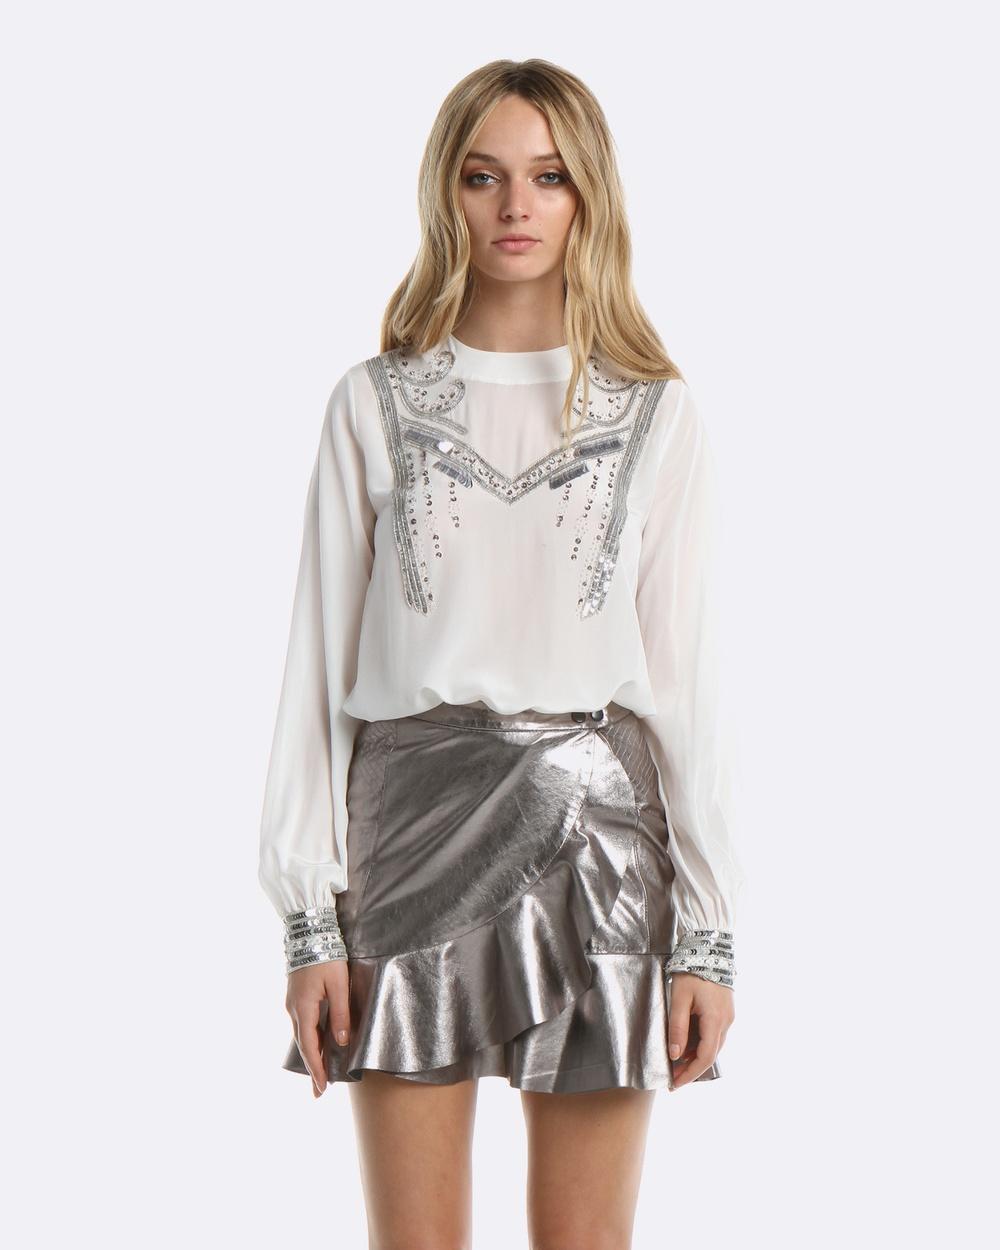 Coco Ribbon Embellished Blouse Tops White Embellished Blouse